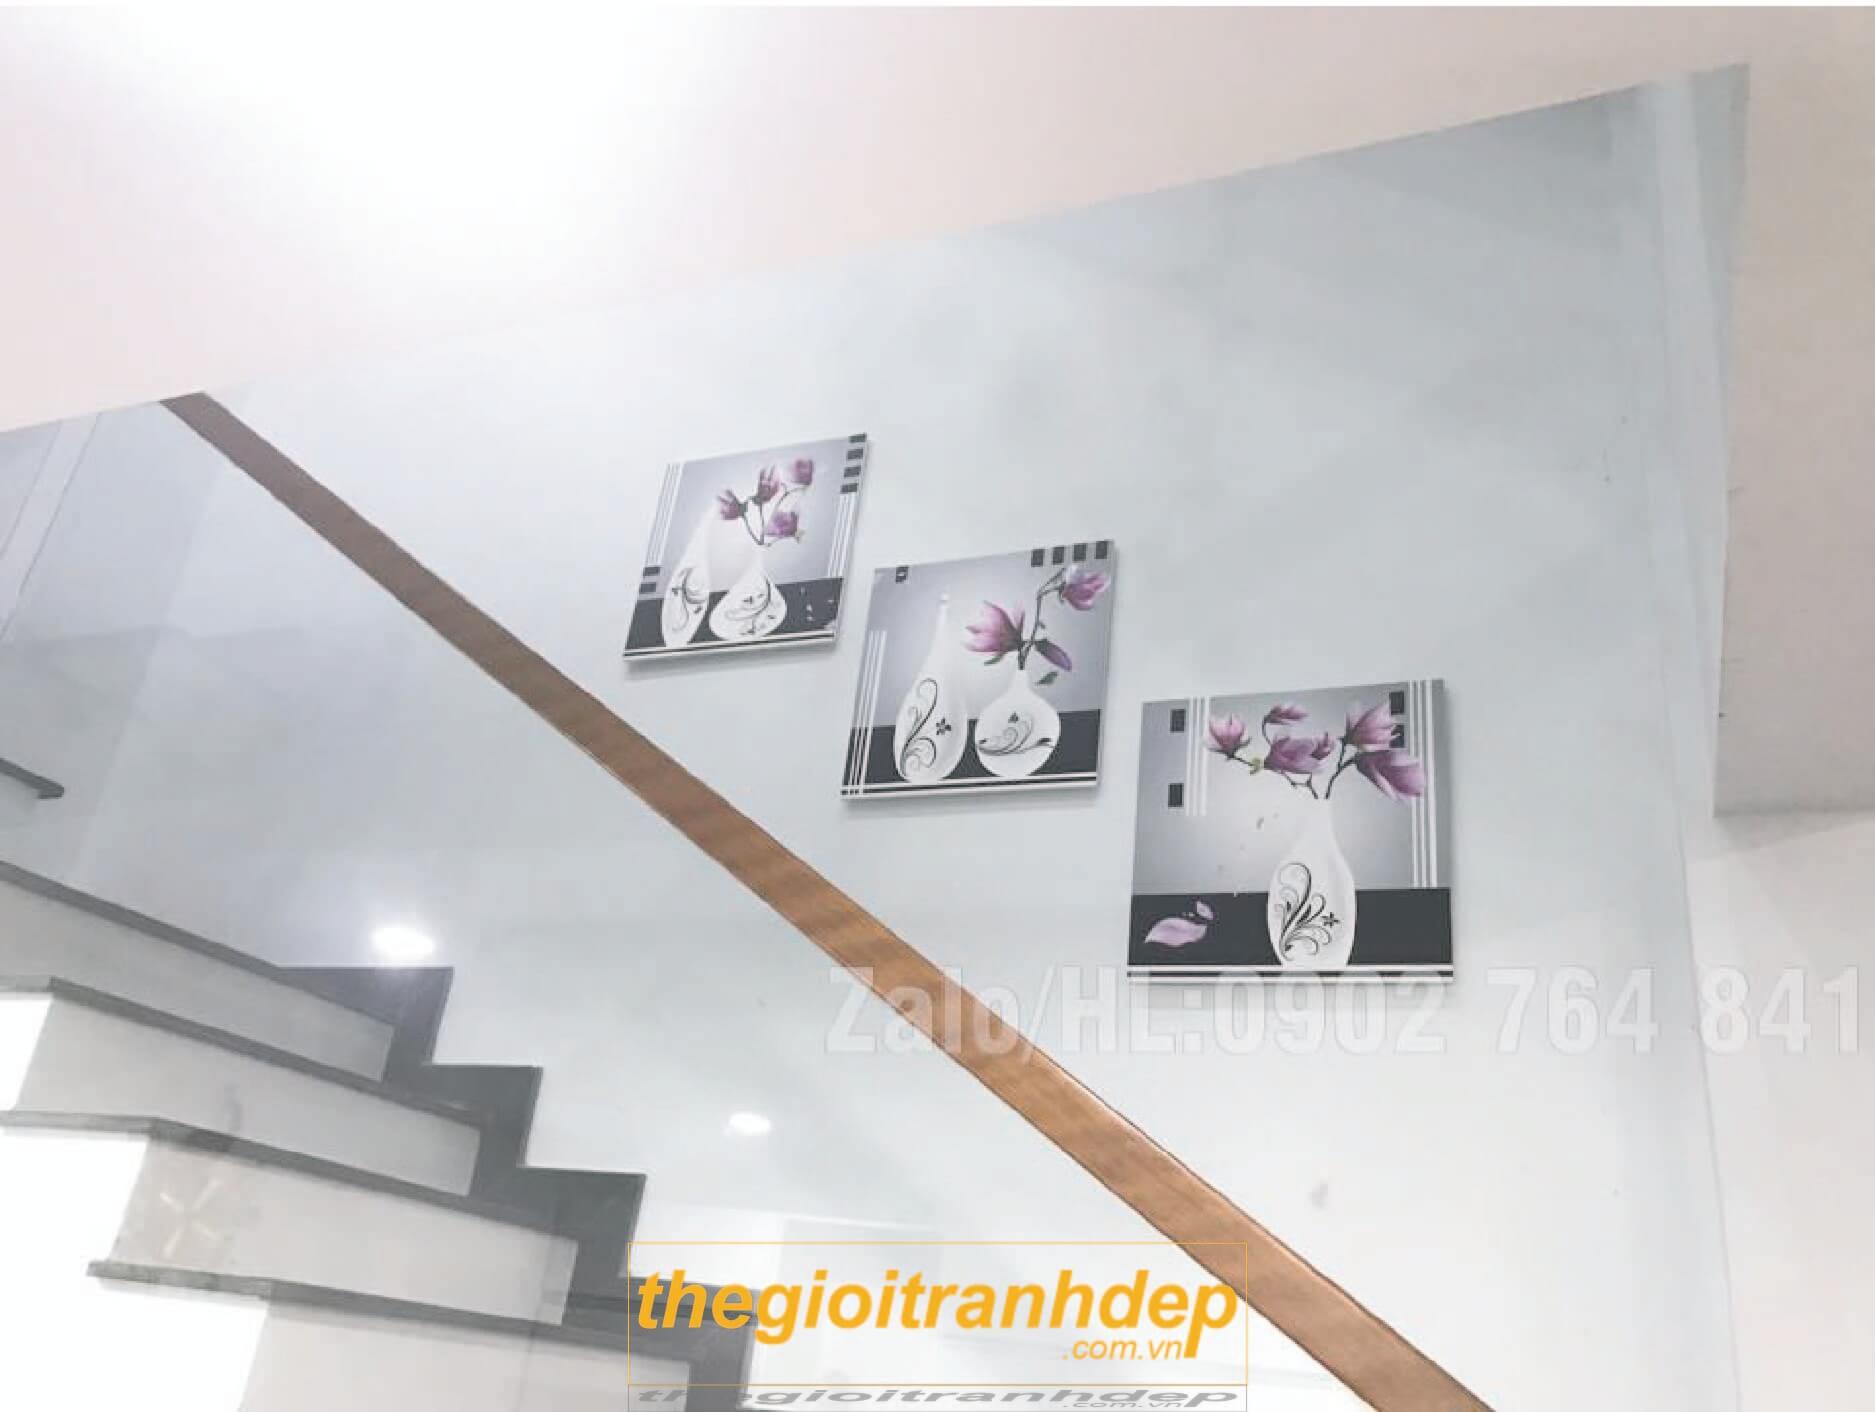 tranh-treo-tuong-cau-thang-05